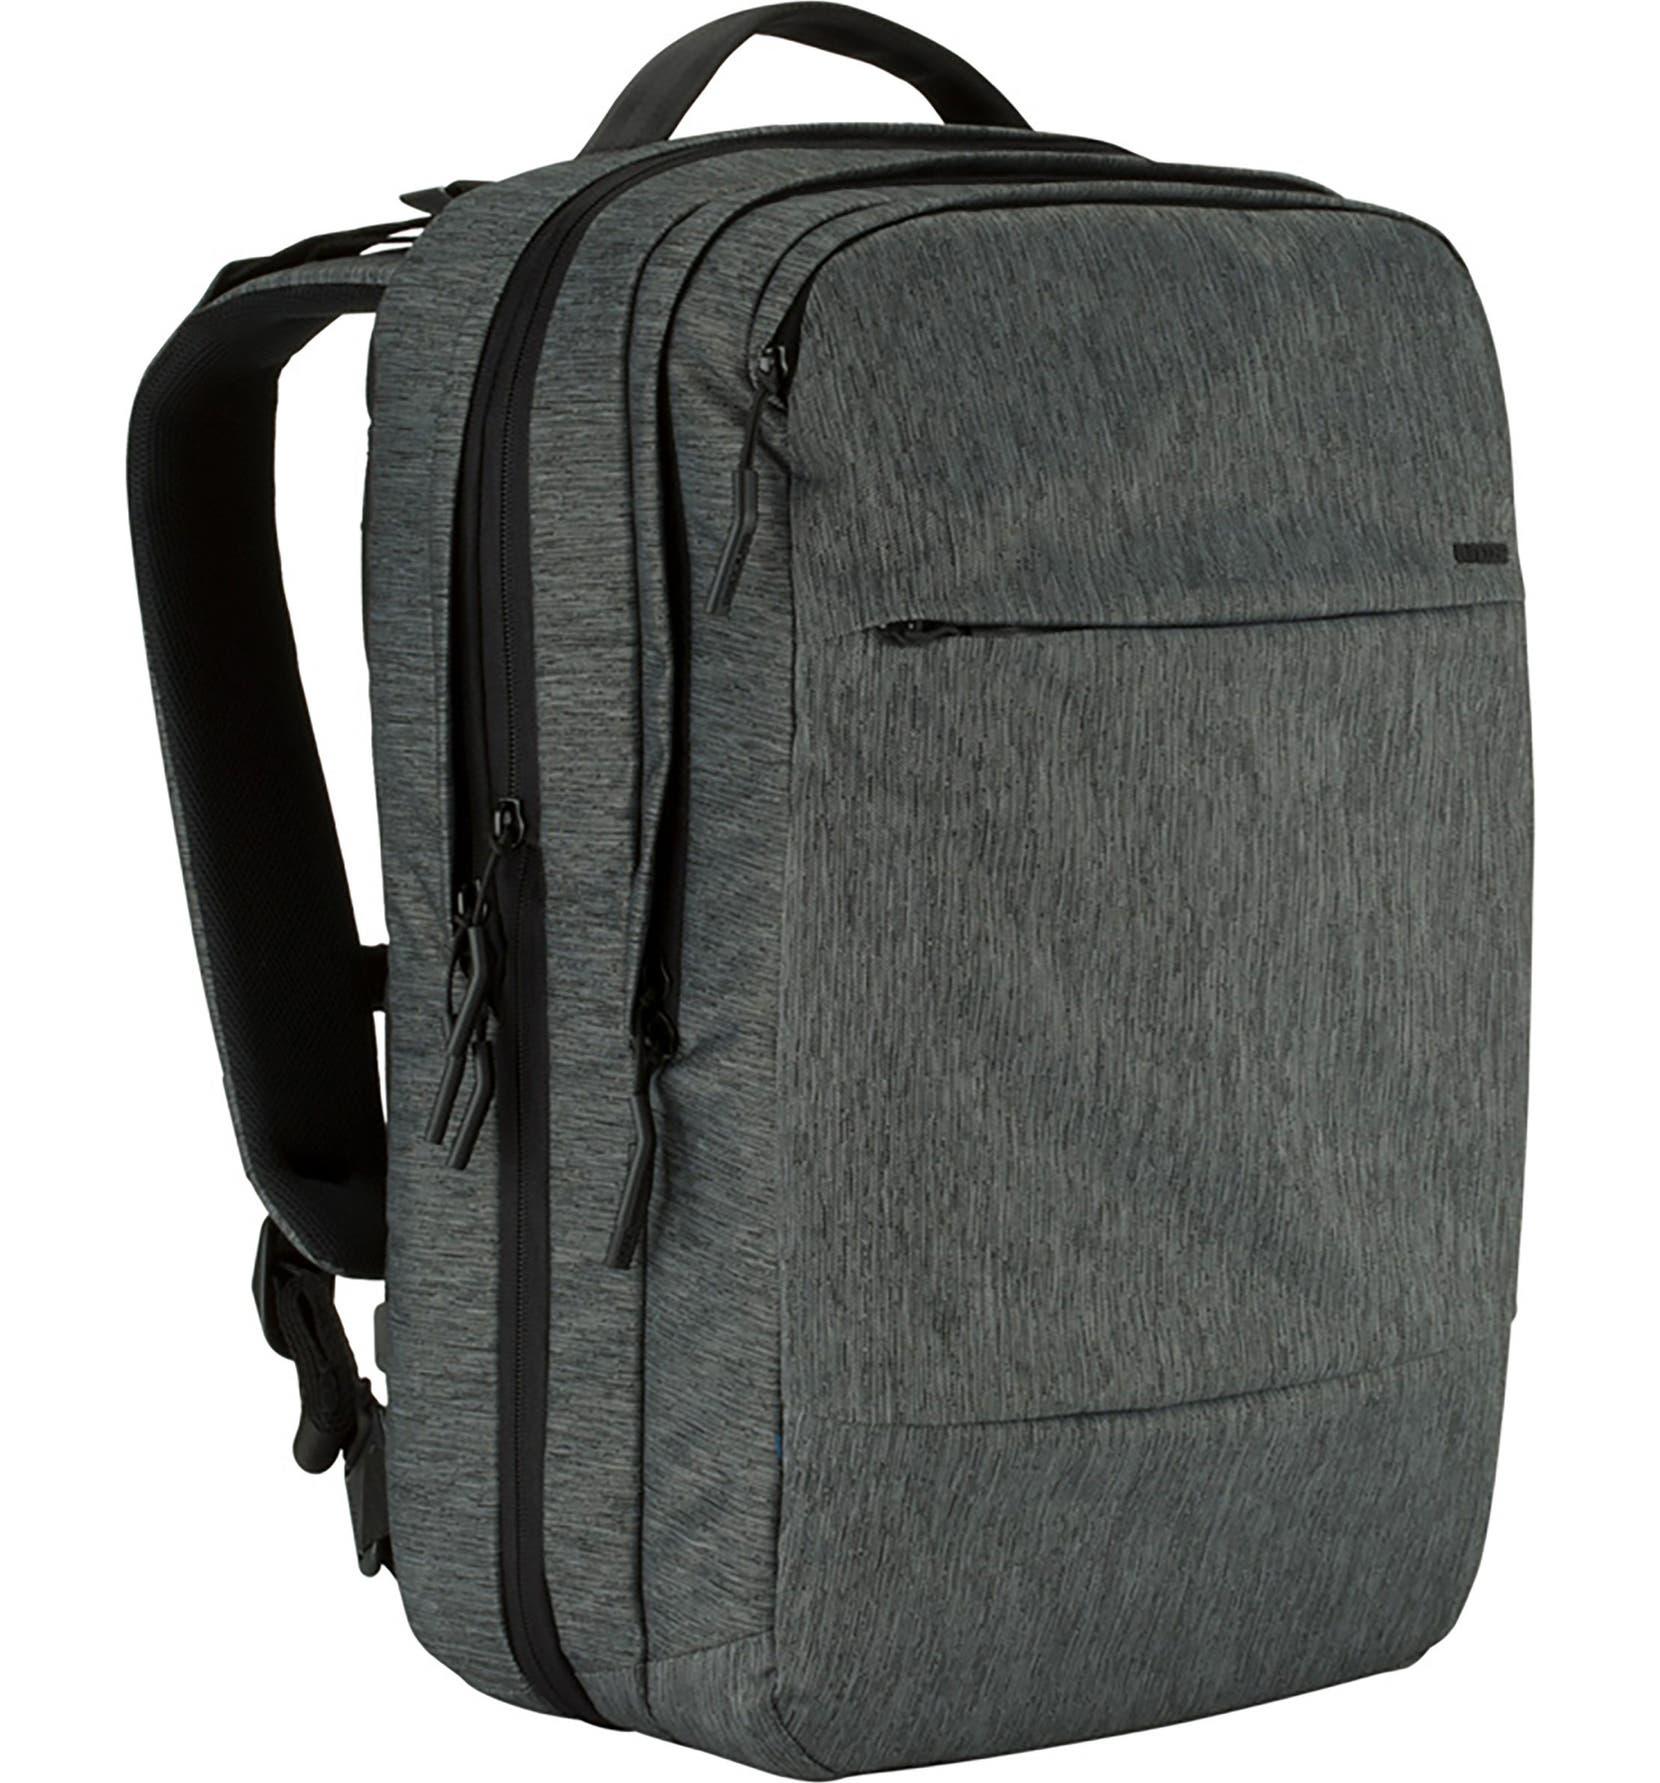 de1aefc01eba Incase Designs City Commuter Backpack